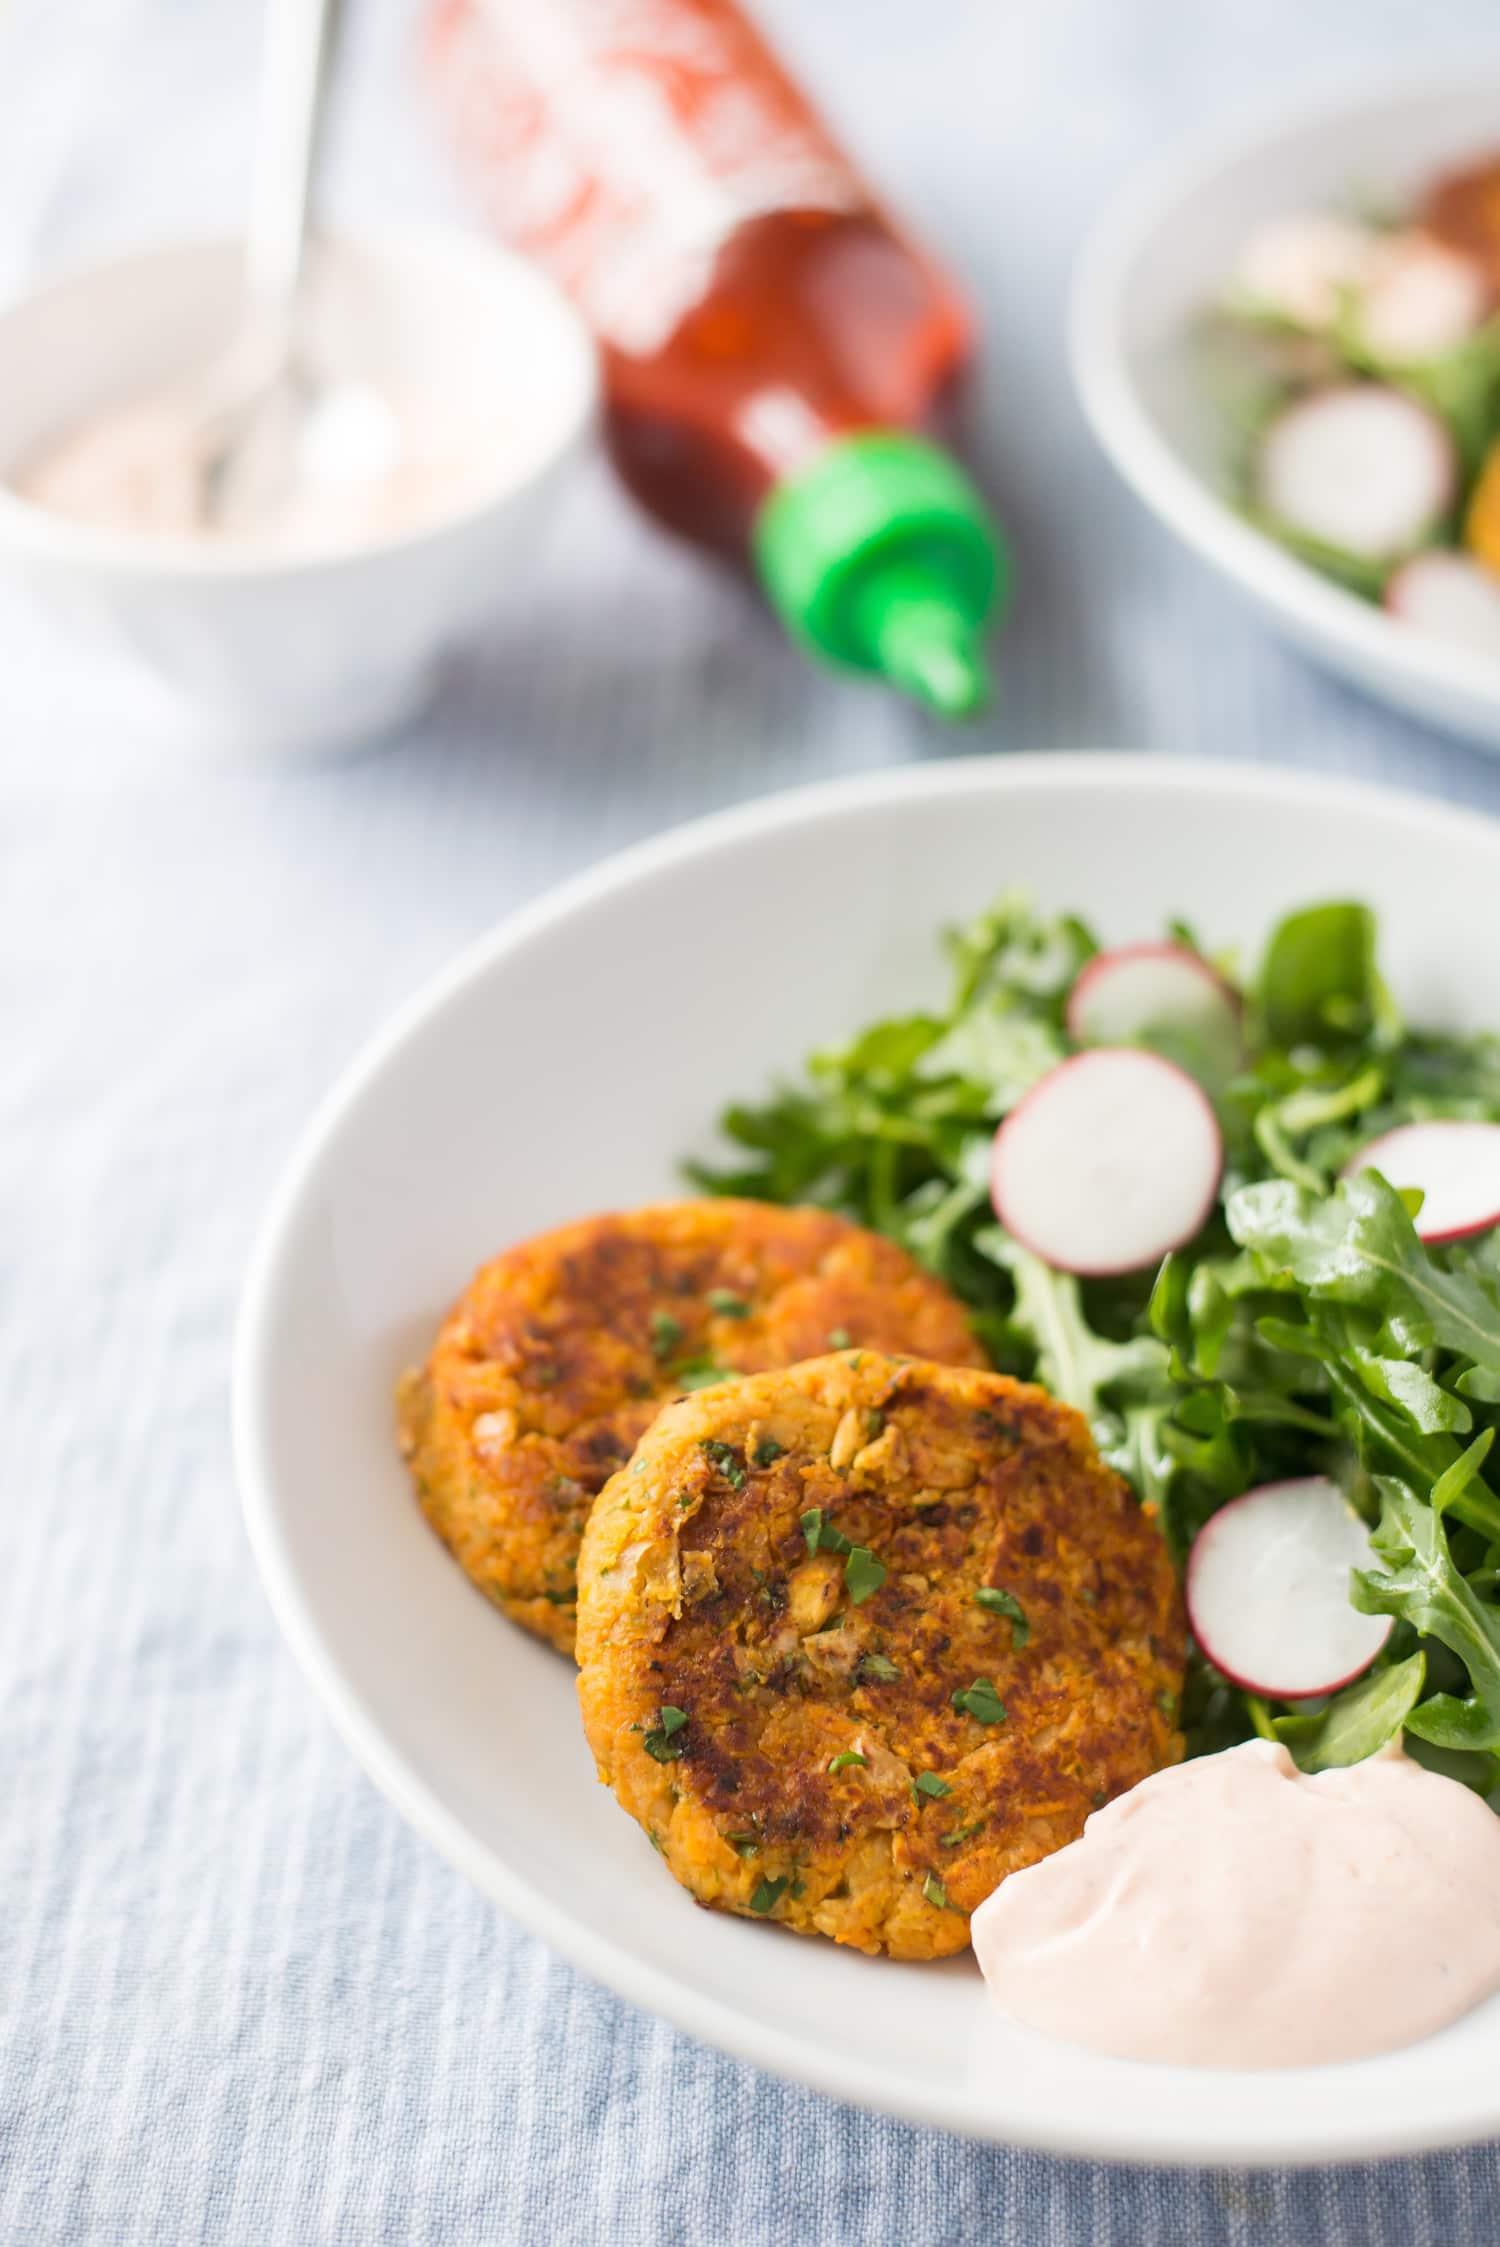 Recipe: Sweet Potato-Chickpea Patties with Sriracha-Yogurt Dip